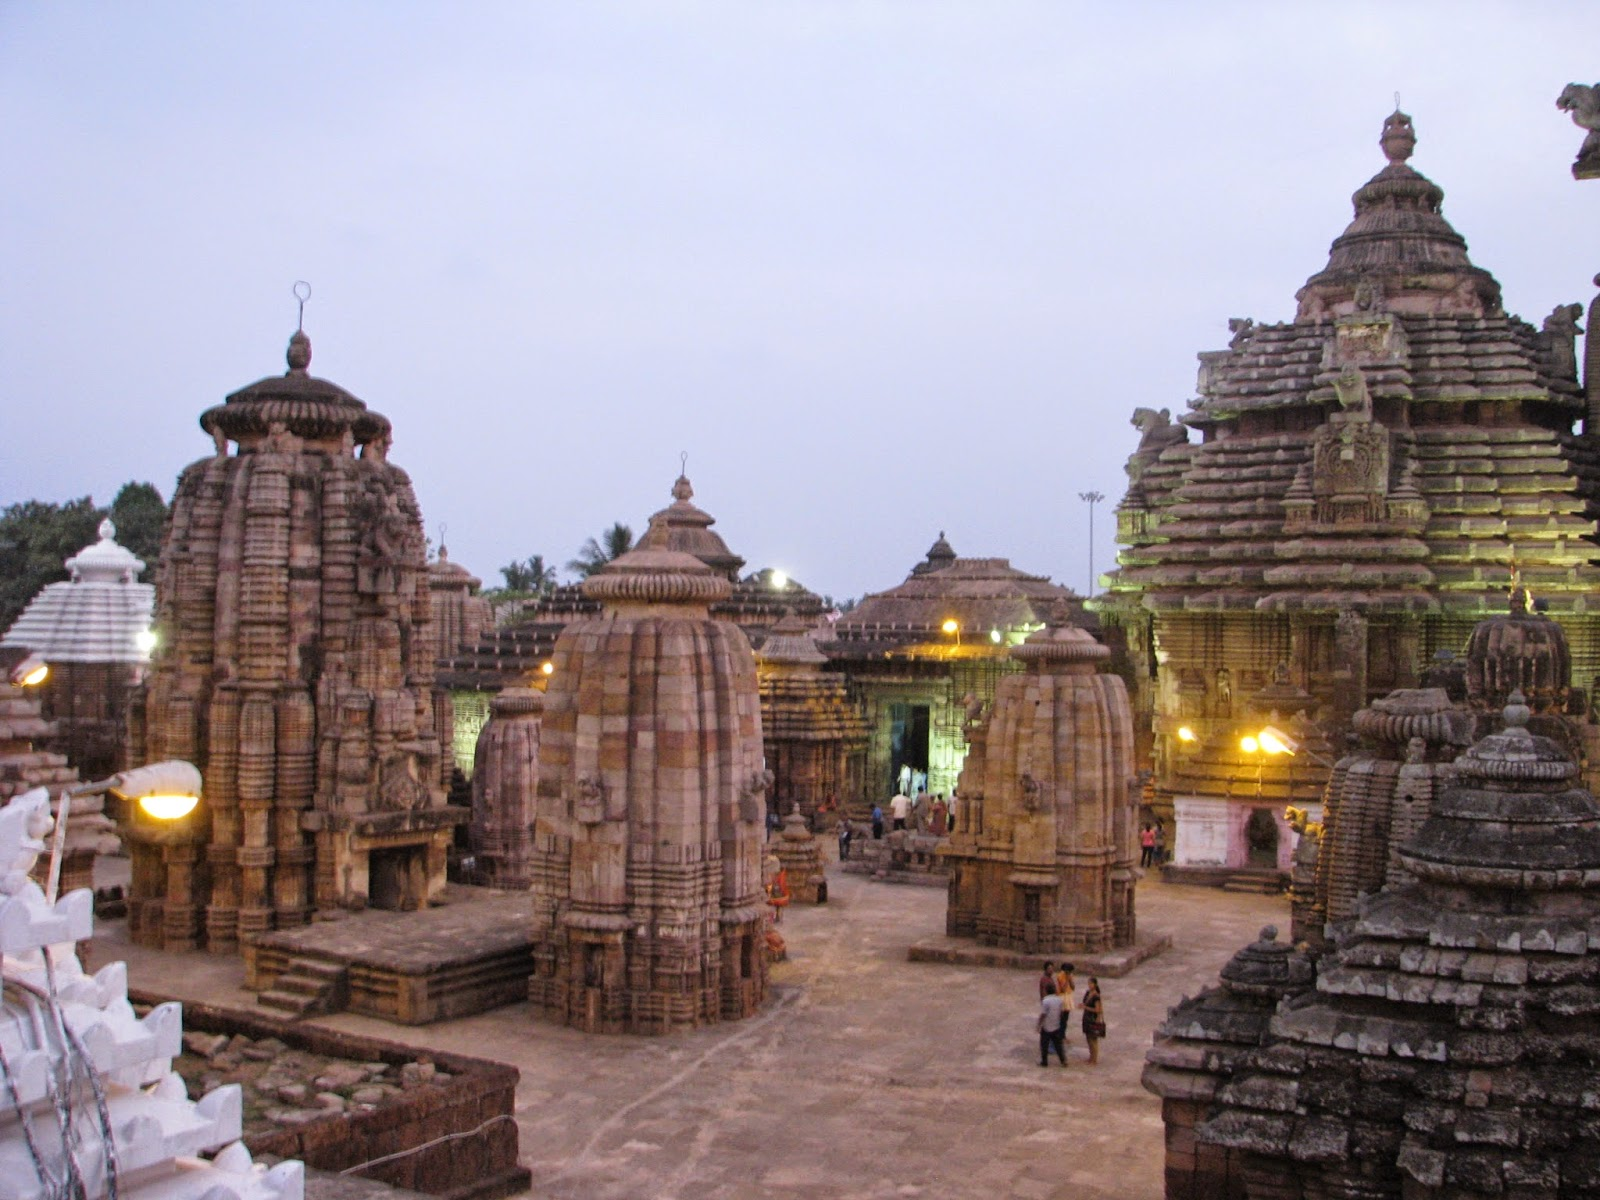 Http www achelsekluis org general home html -  Text About Com Images Wikmedia Parasurameswara Temple